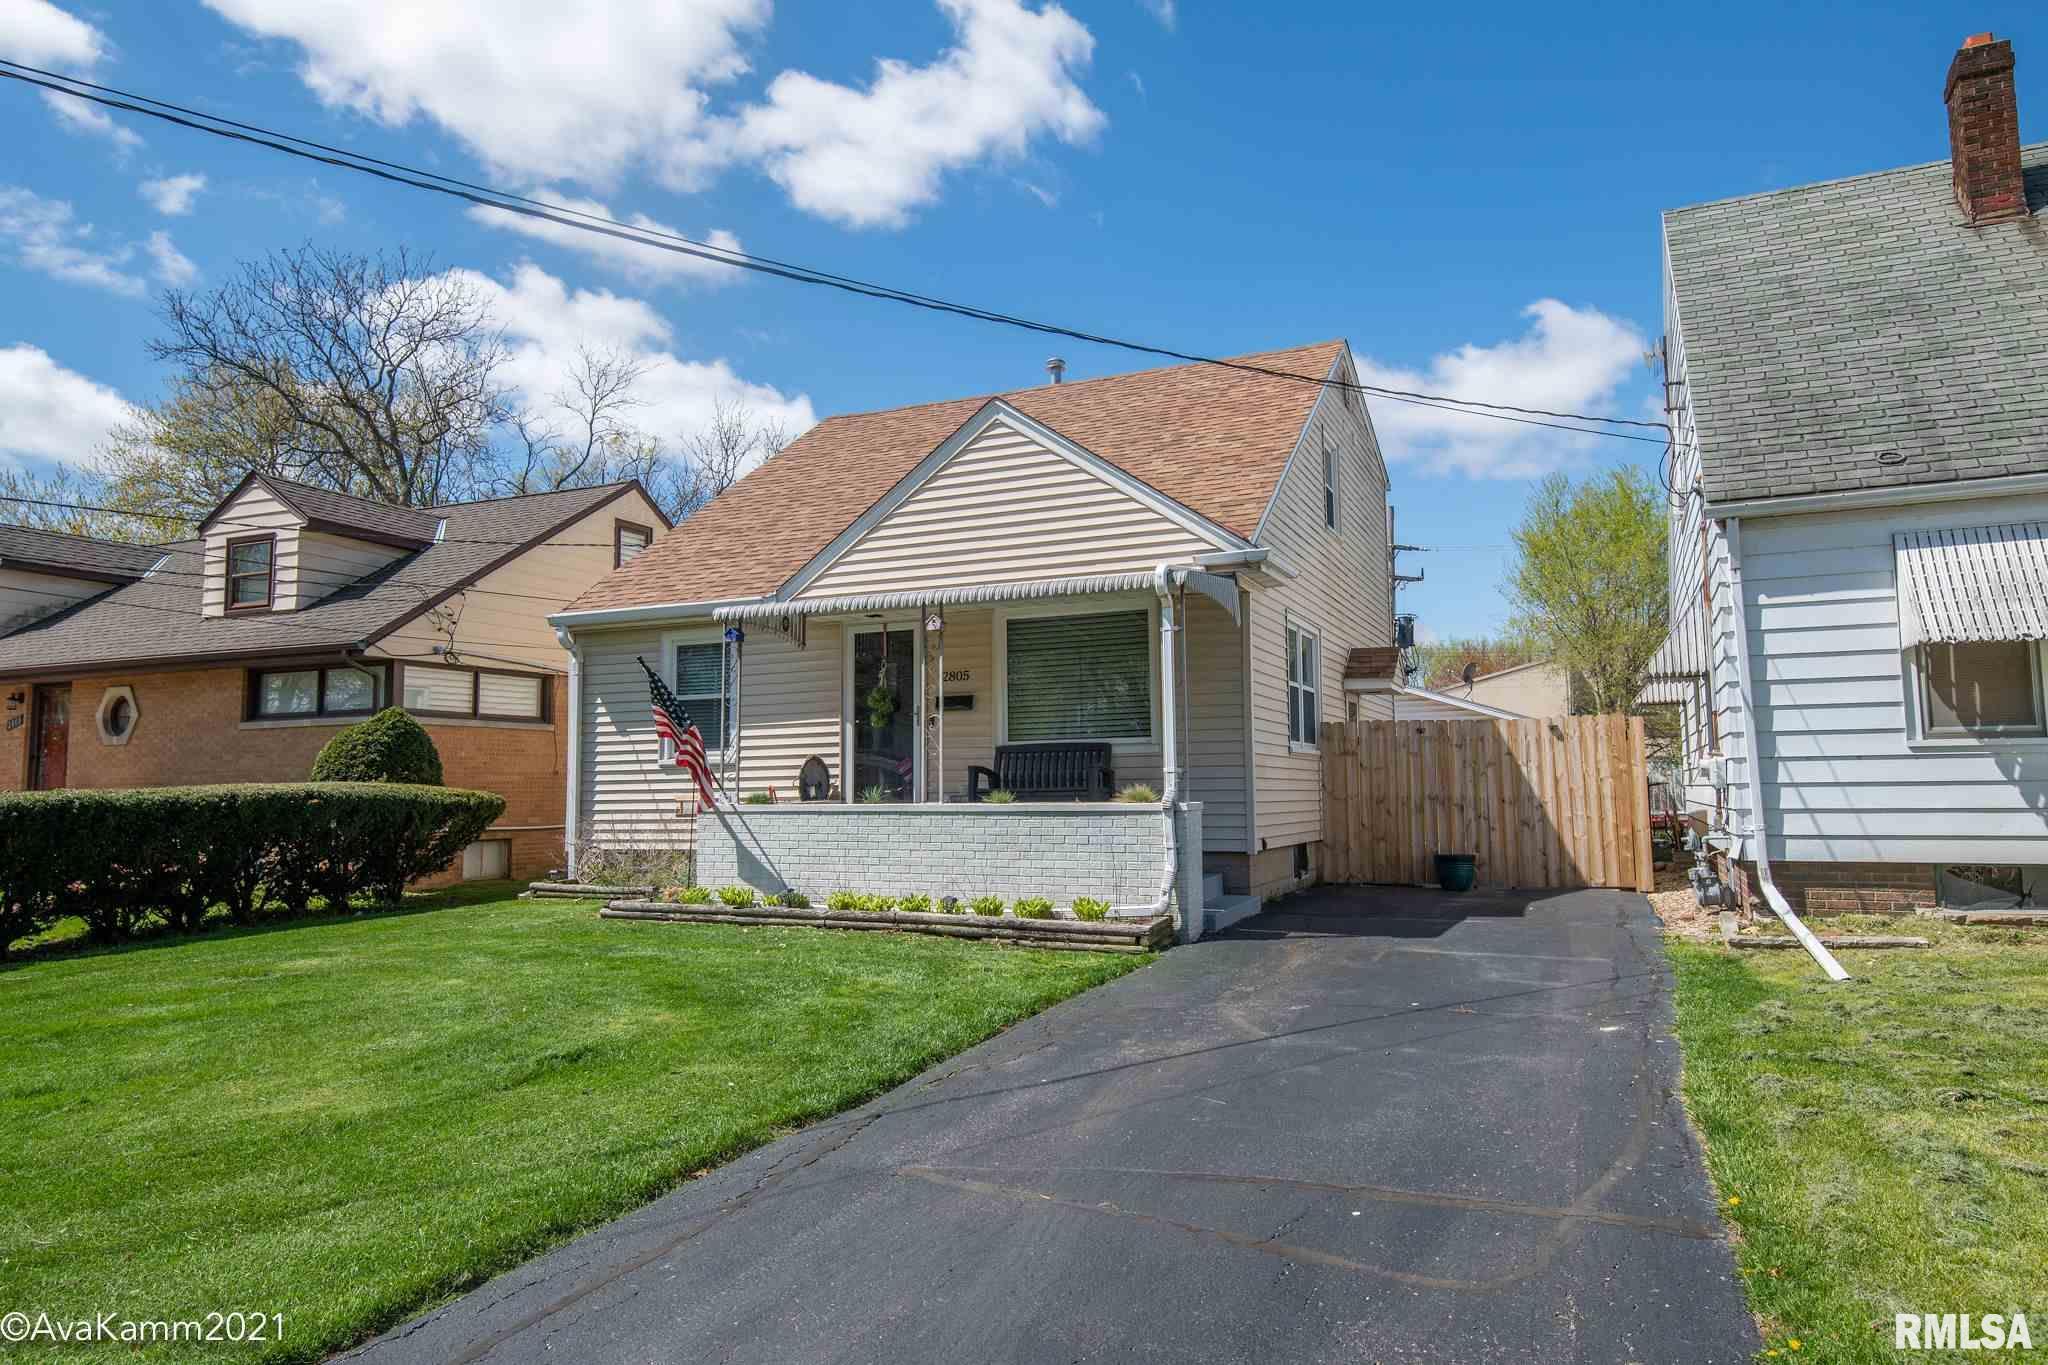 2805 N DECHMAN Property Photo - Peoria, IL real estate listing